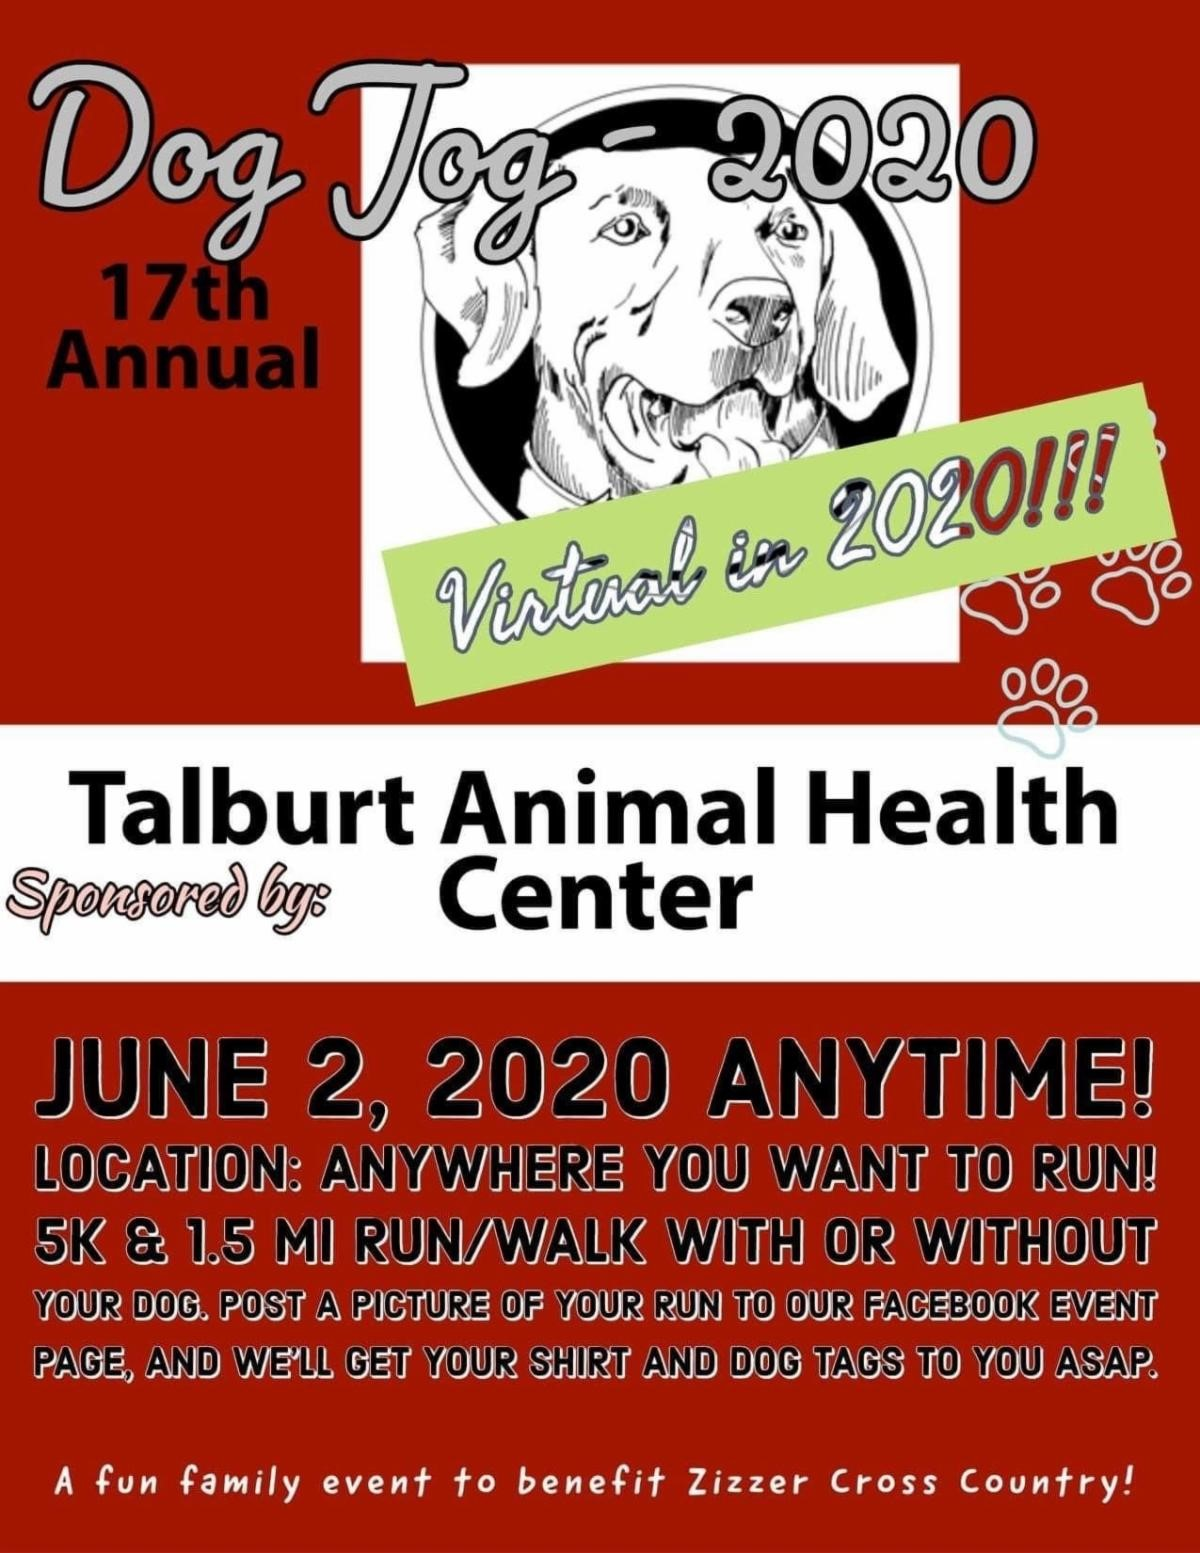 17th Annual Dog Jog @ Virtual Event